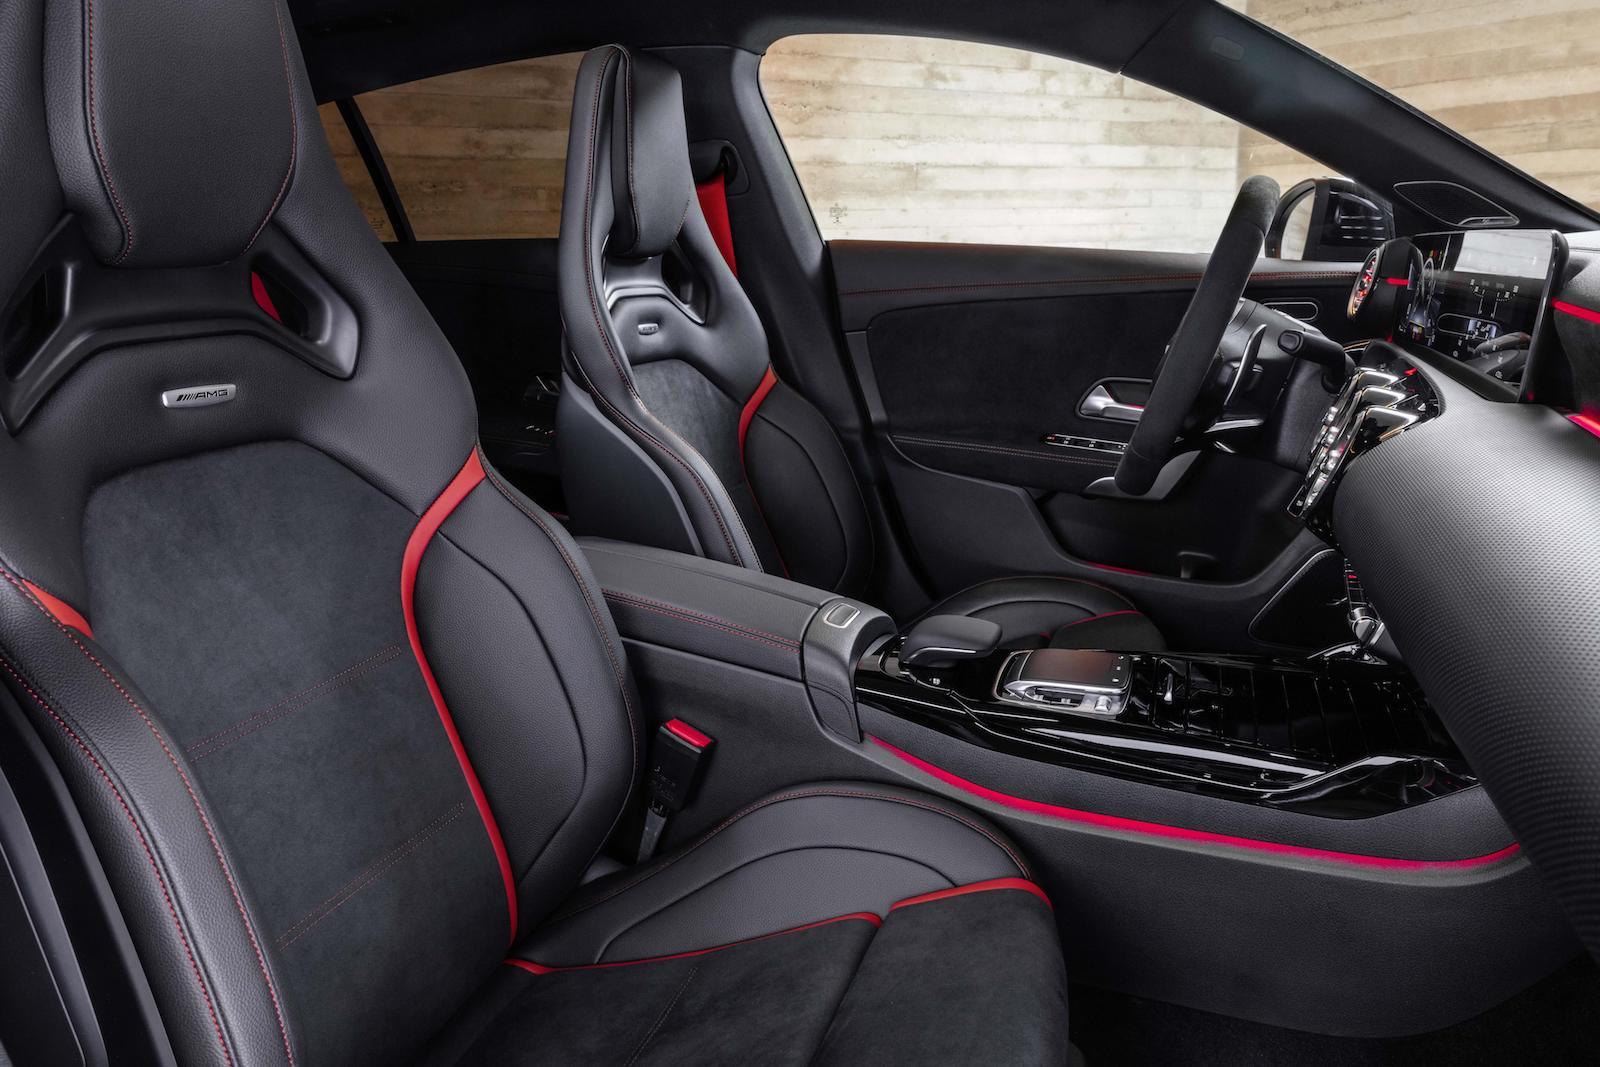 Mercedes Cla 45 Amg For Sale >> 2020 Mercedes-AMG CLA 45 Shoot Brake revealed   PerformanceDrive